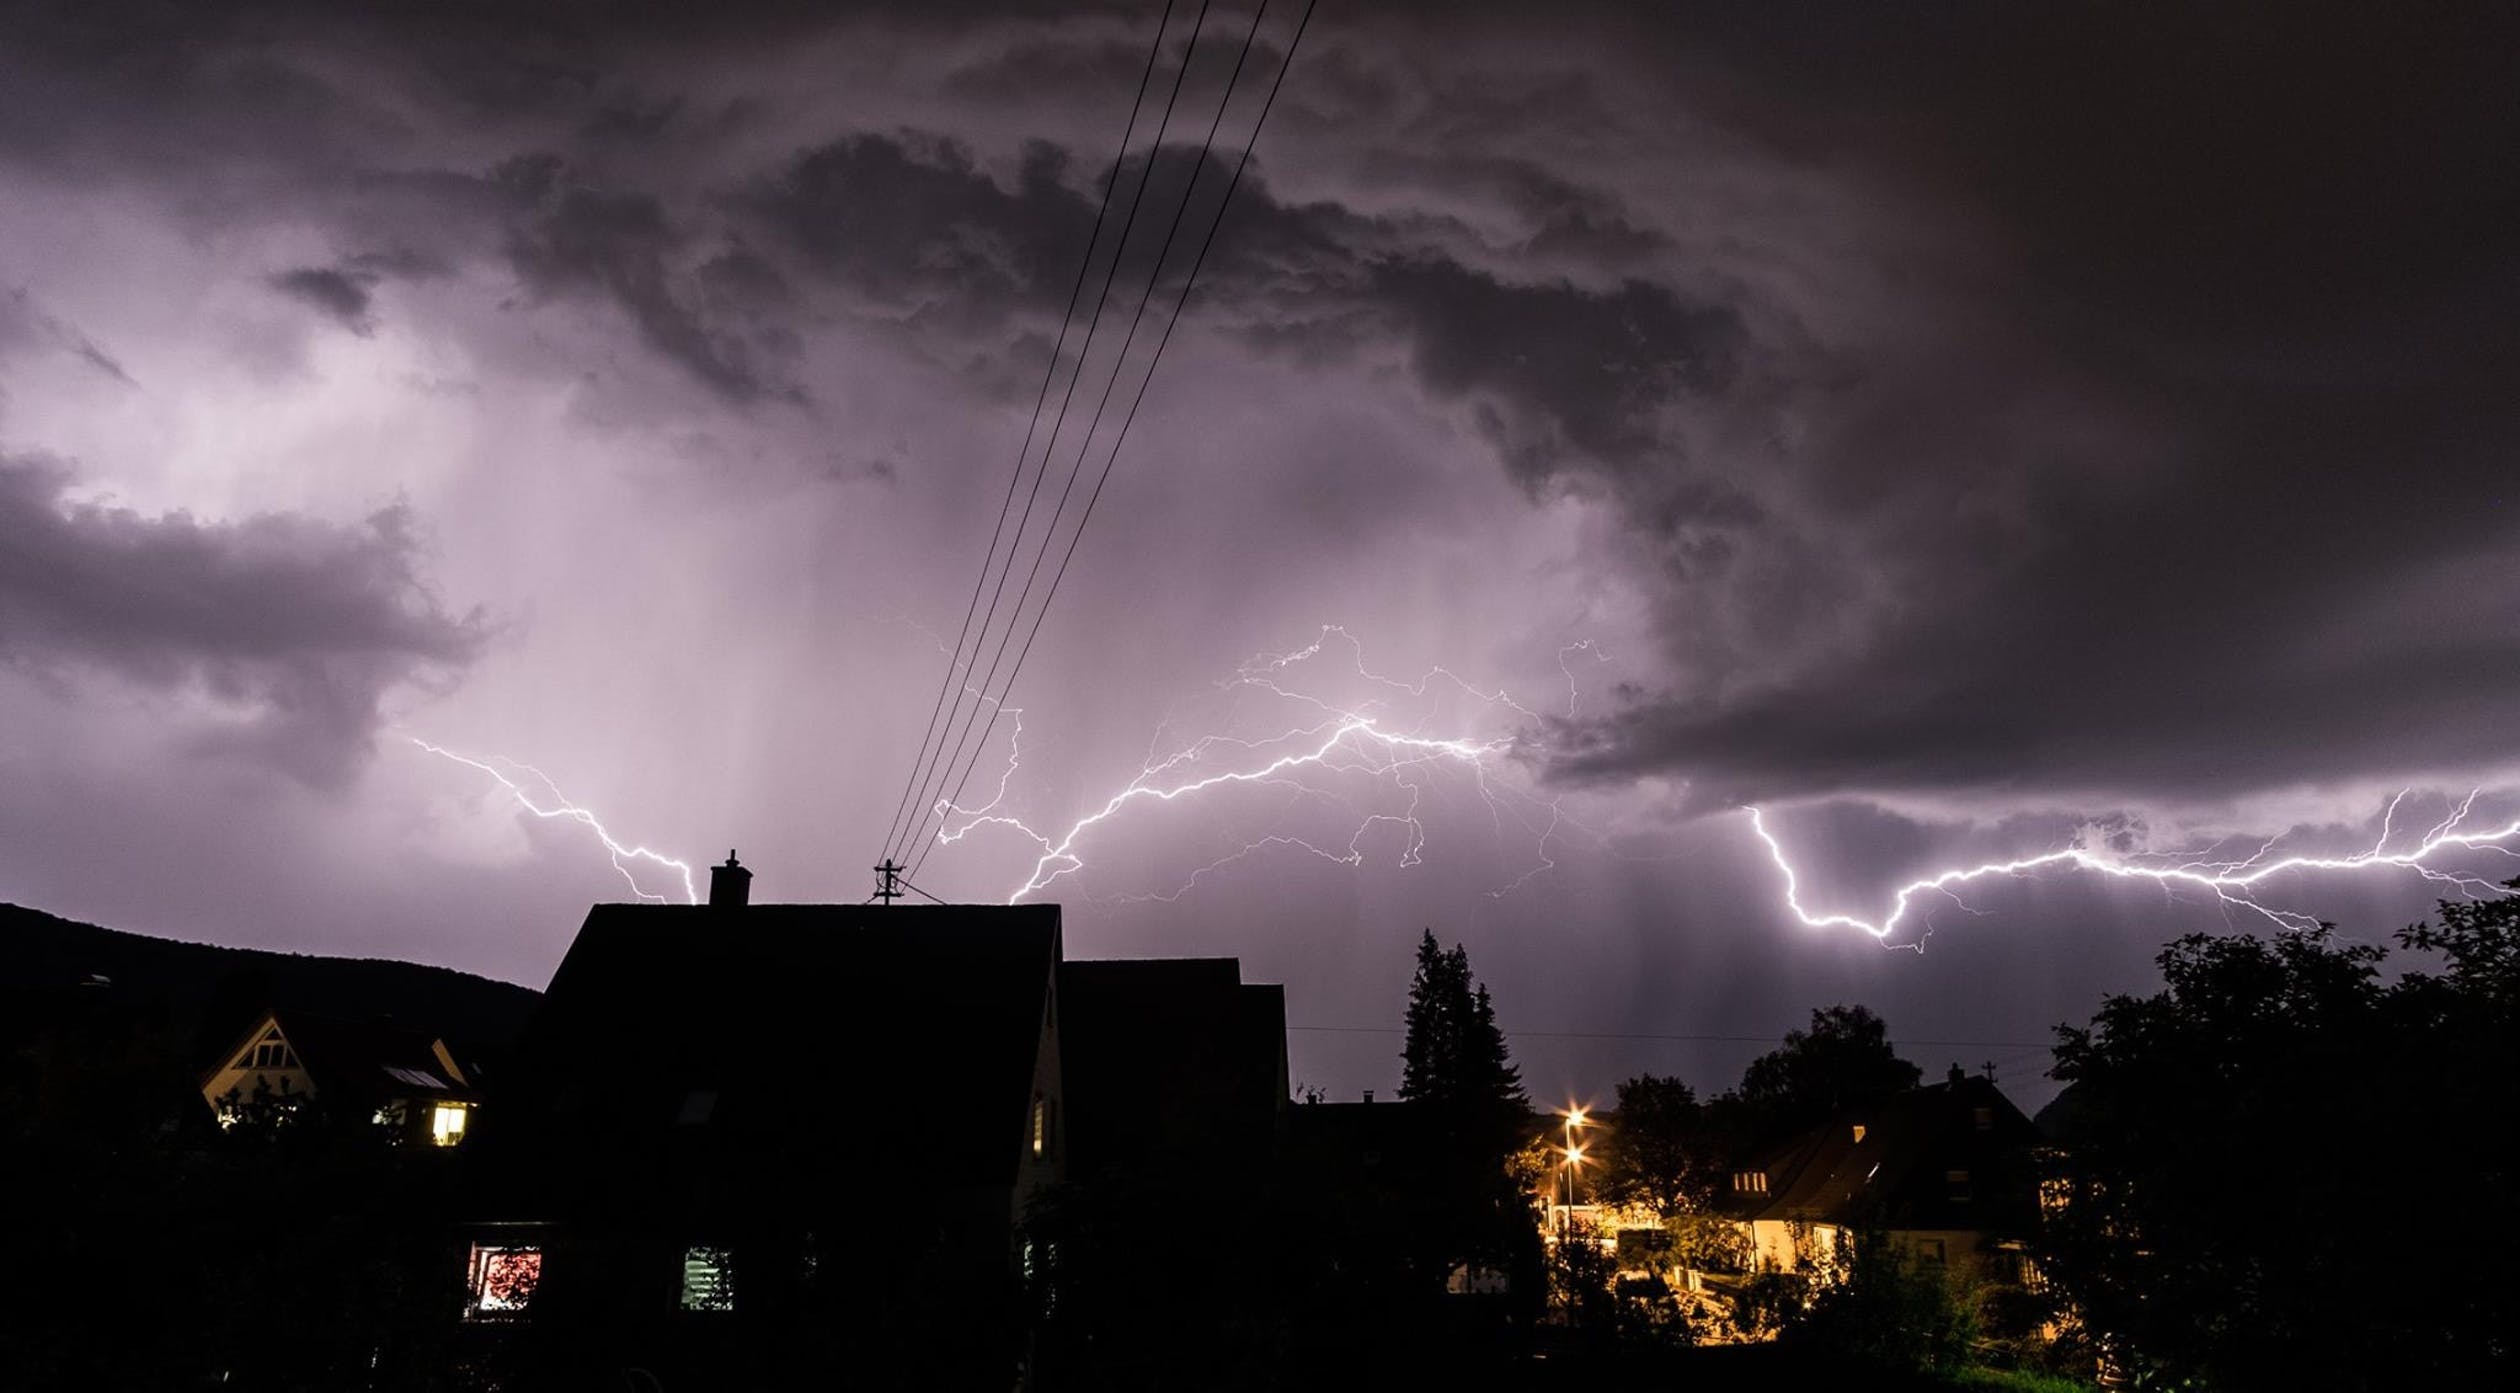 Lightning in a neighborhood.